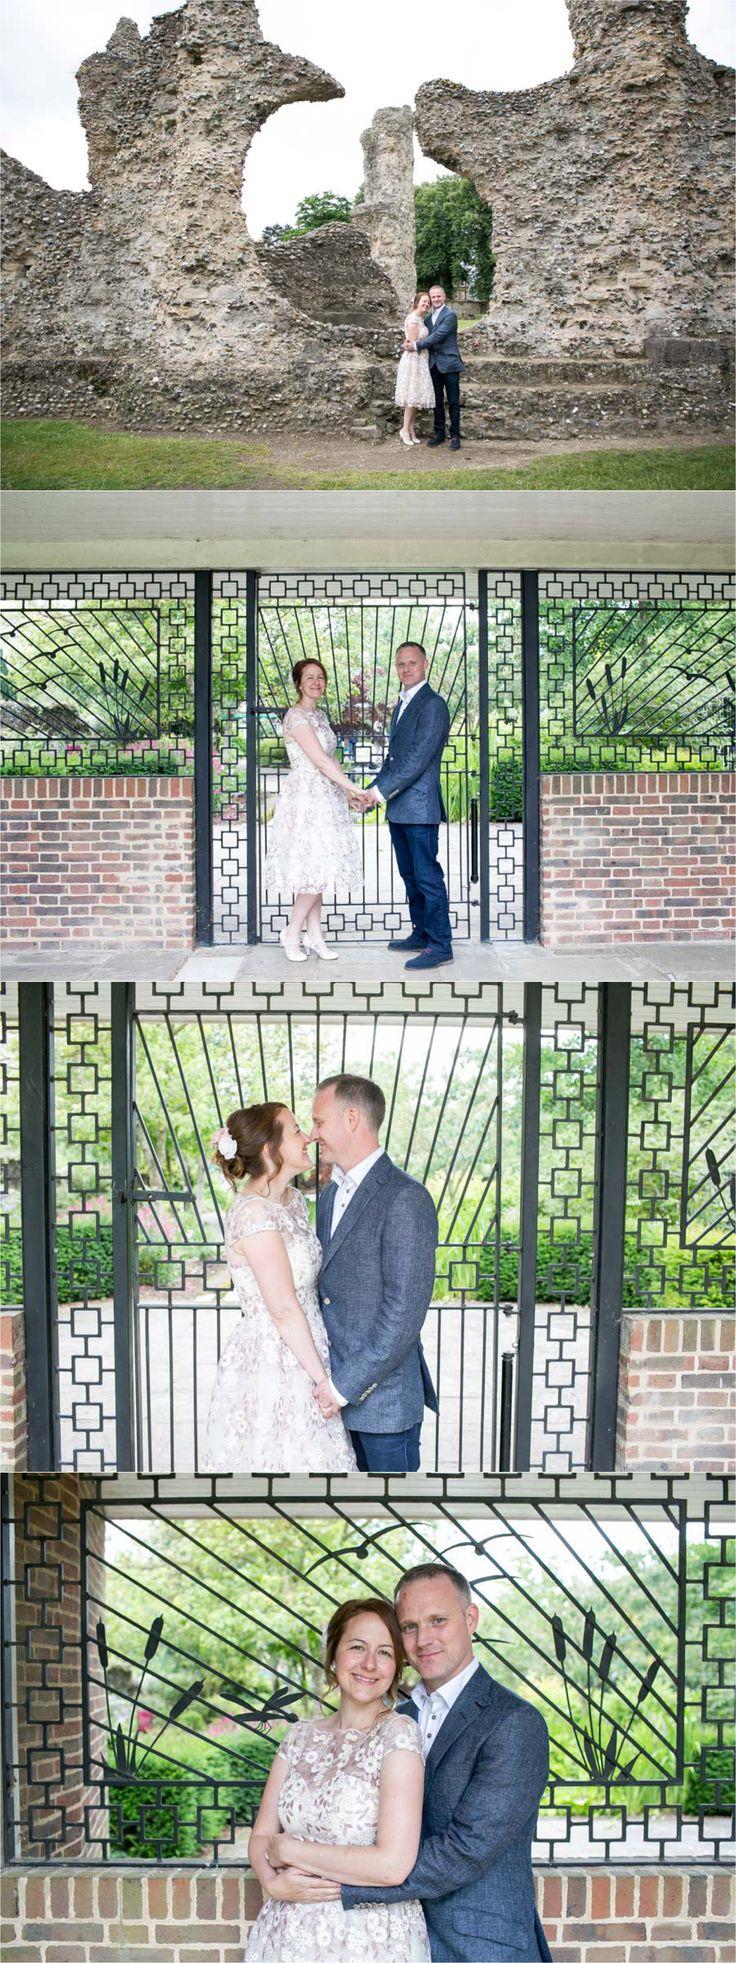 elopement wedding photography in the abbey garden, bury st edmunds.